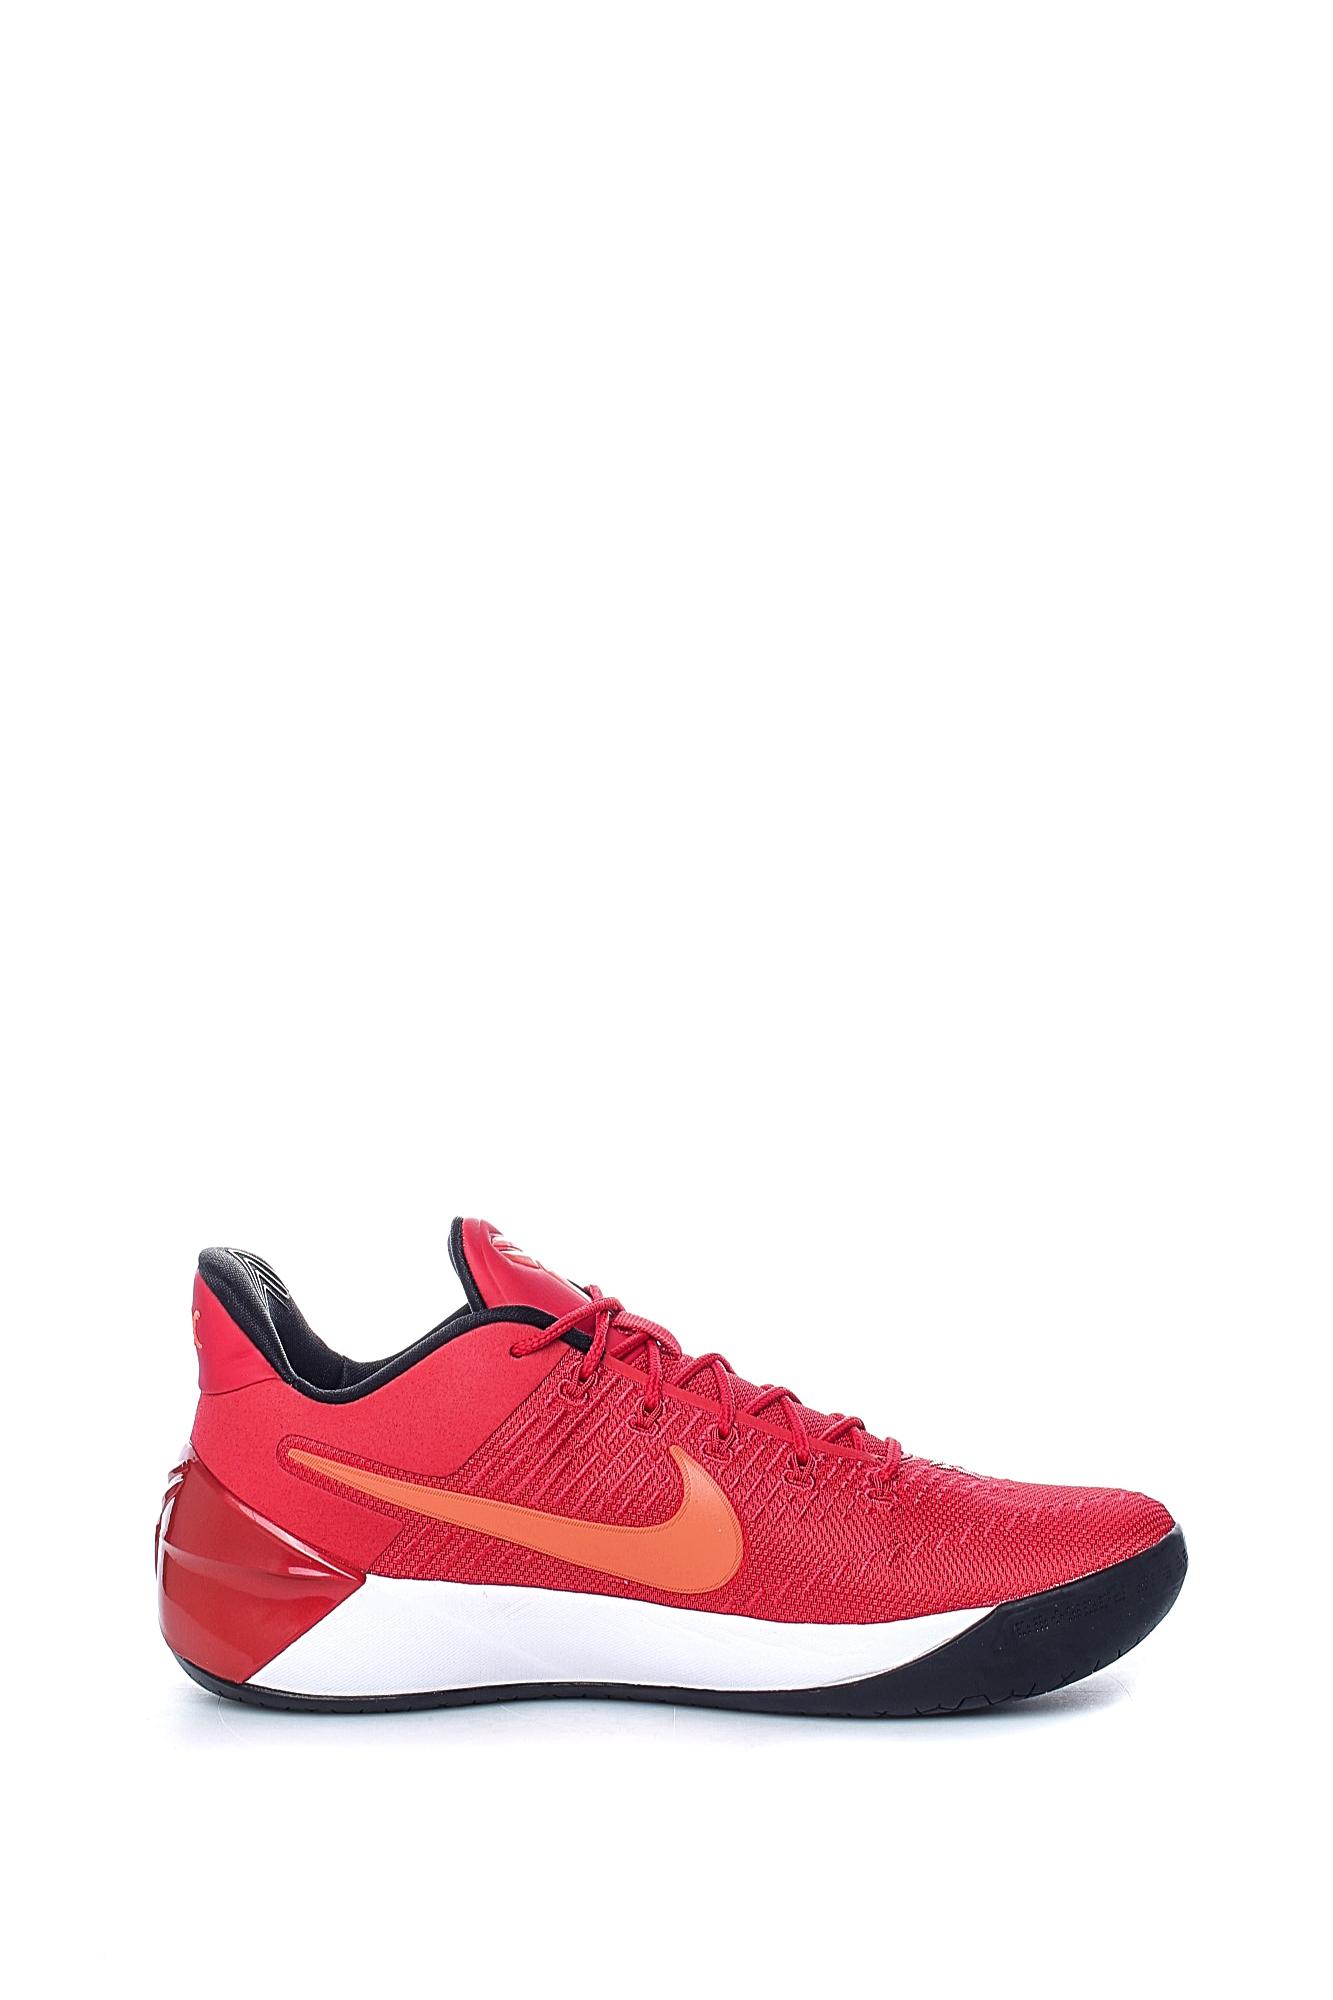 NIKE – Ανδρικά παπούτσια για μπάσκετ Nike KOBE A.D. κόκκινα